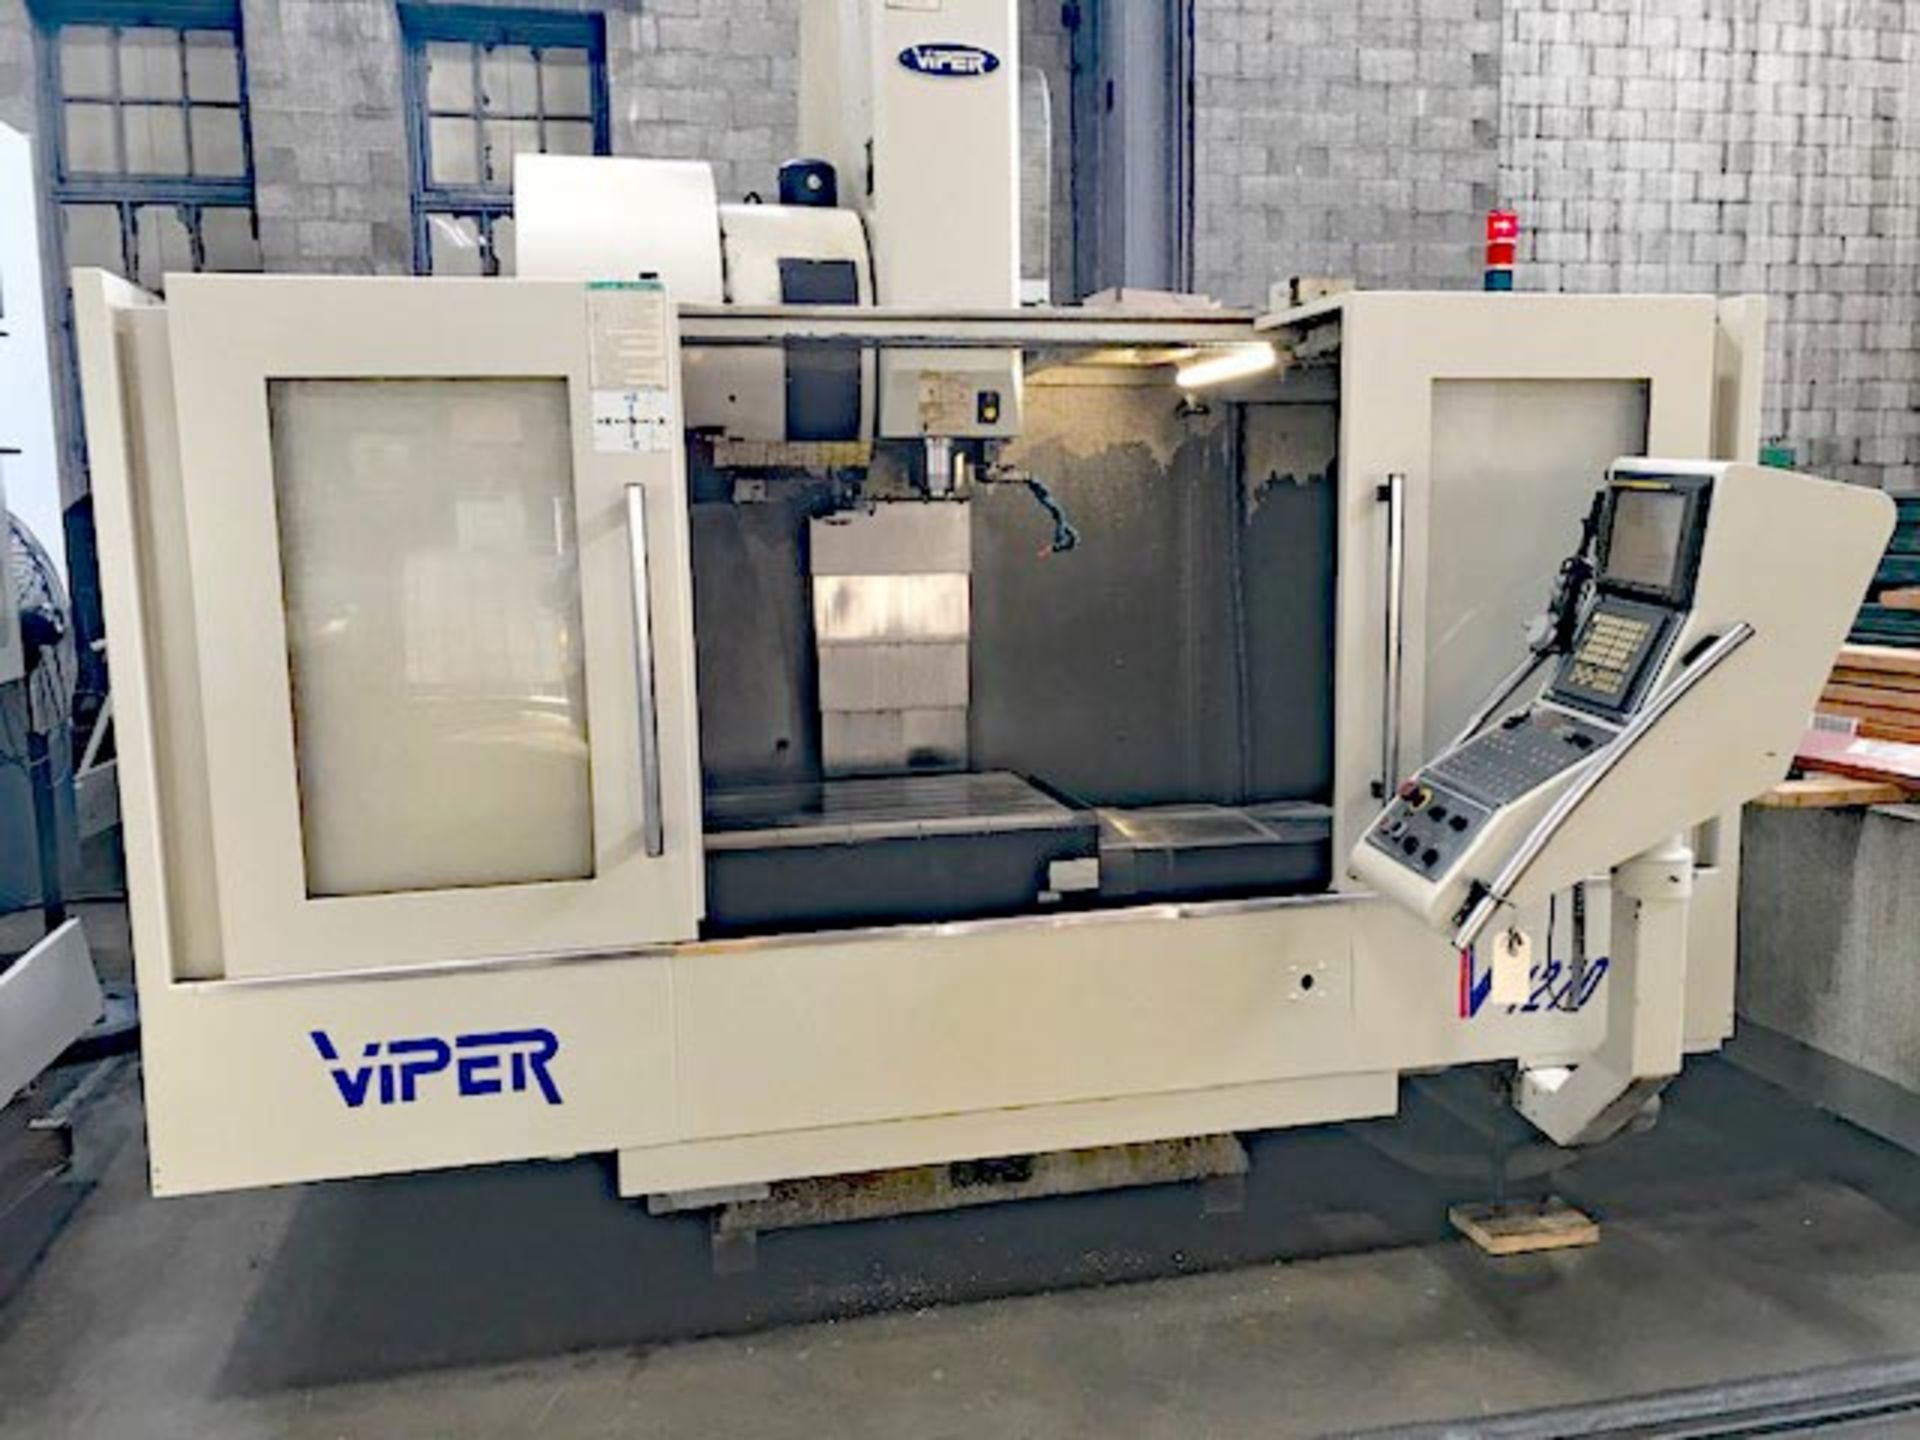 MIGHTY VIPER MODEL VMC-1270 CNC VMC, YEAR 2004, SN 005616